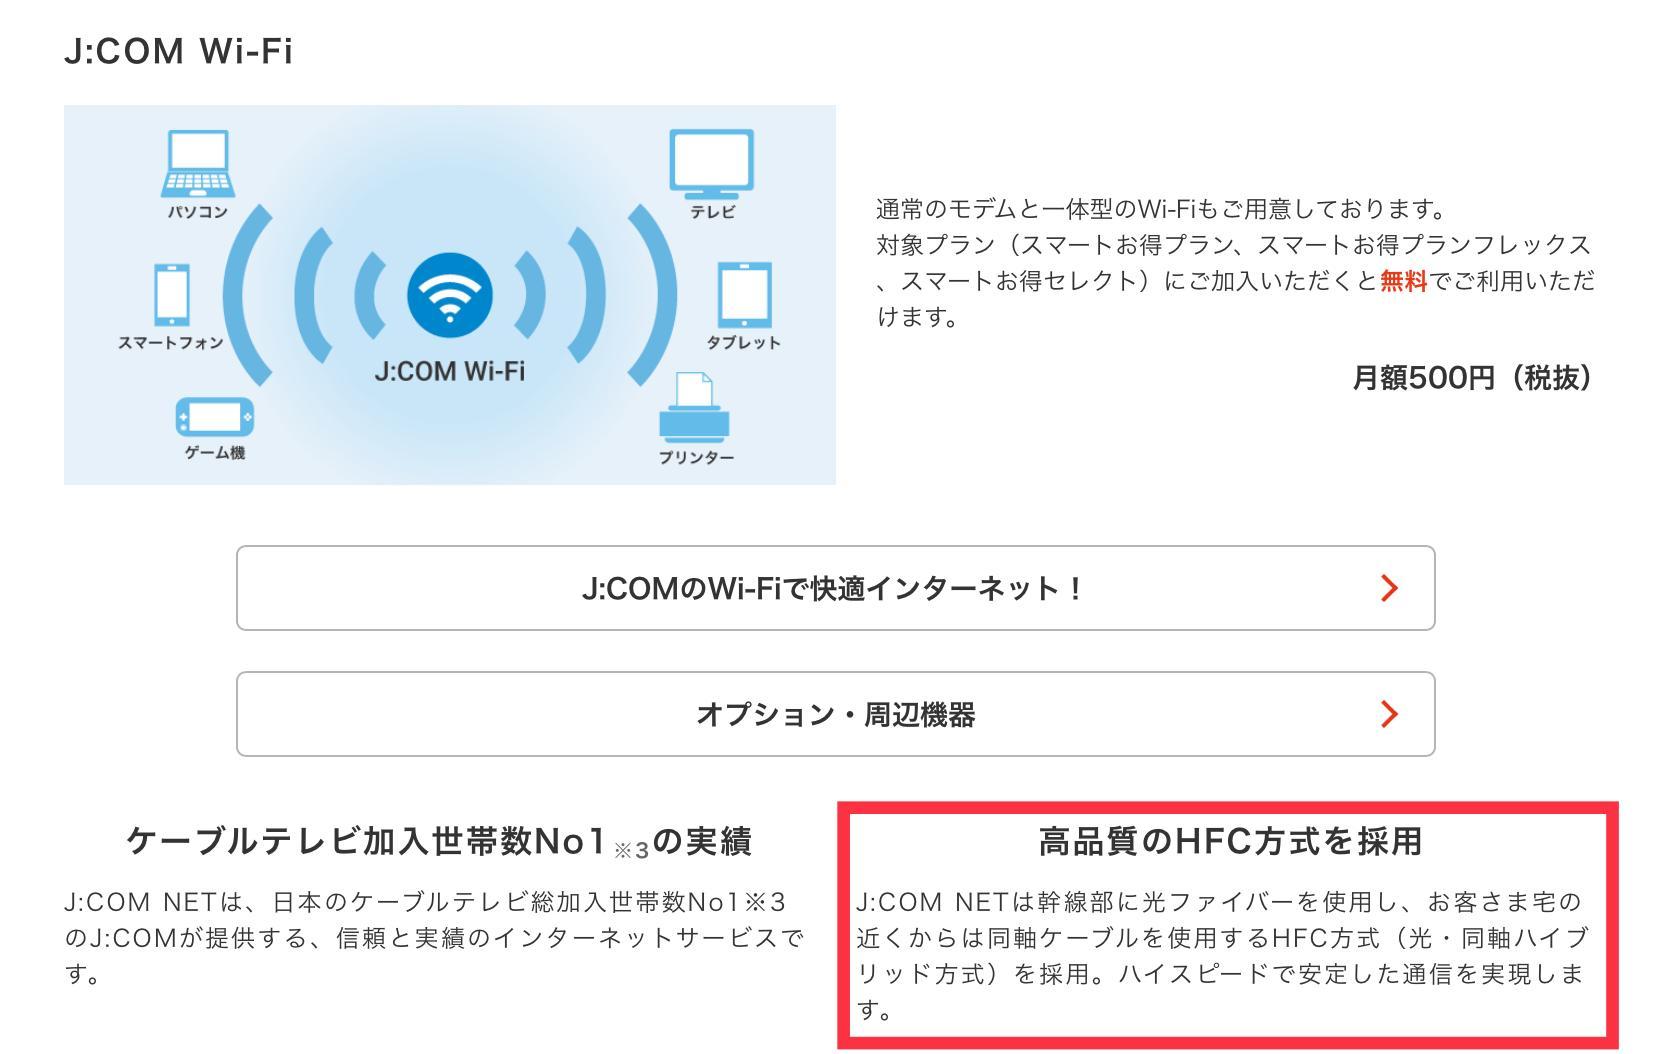 J:COMの光回線はHFC方式